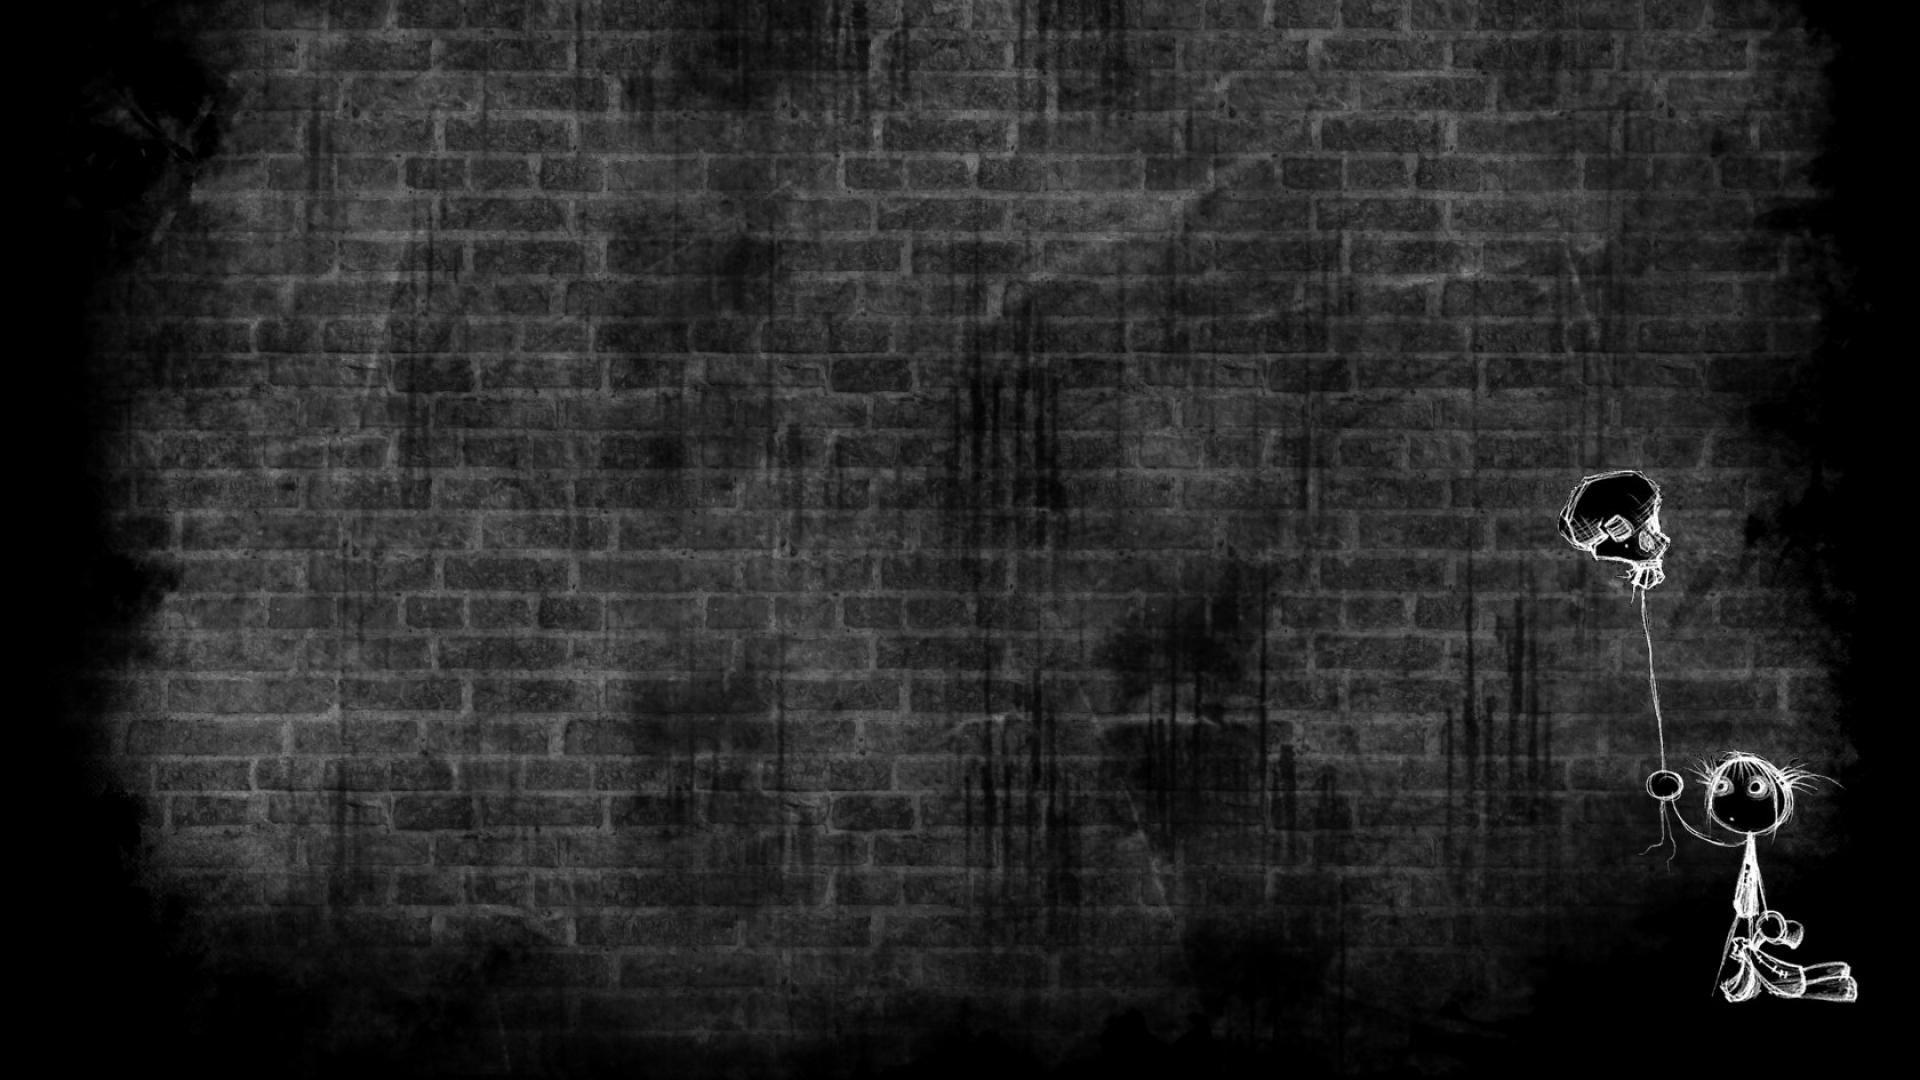 Download Wallpaper 1920x1080 Wall Rocks Brick White Drawing